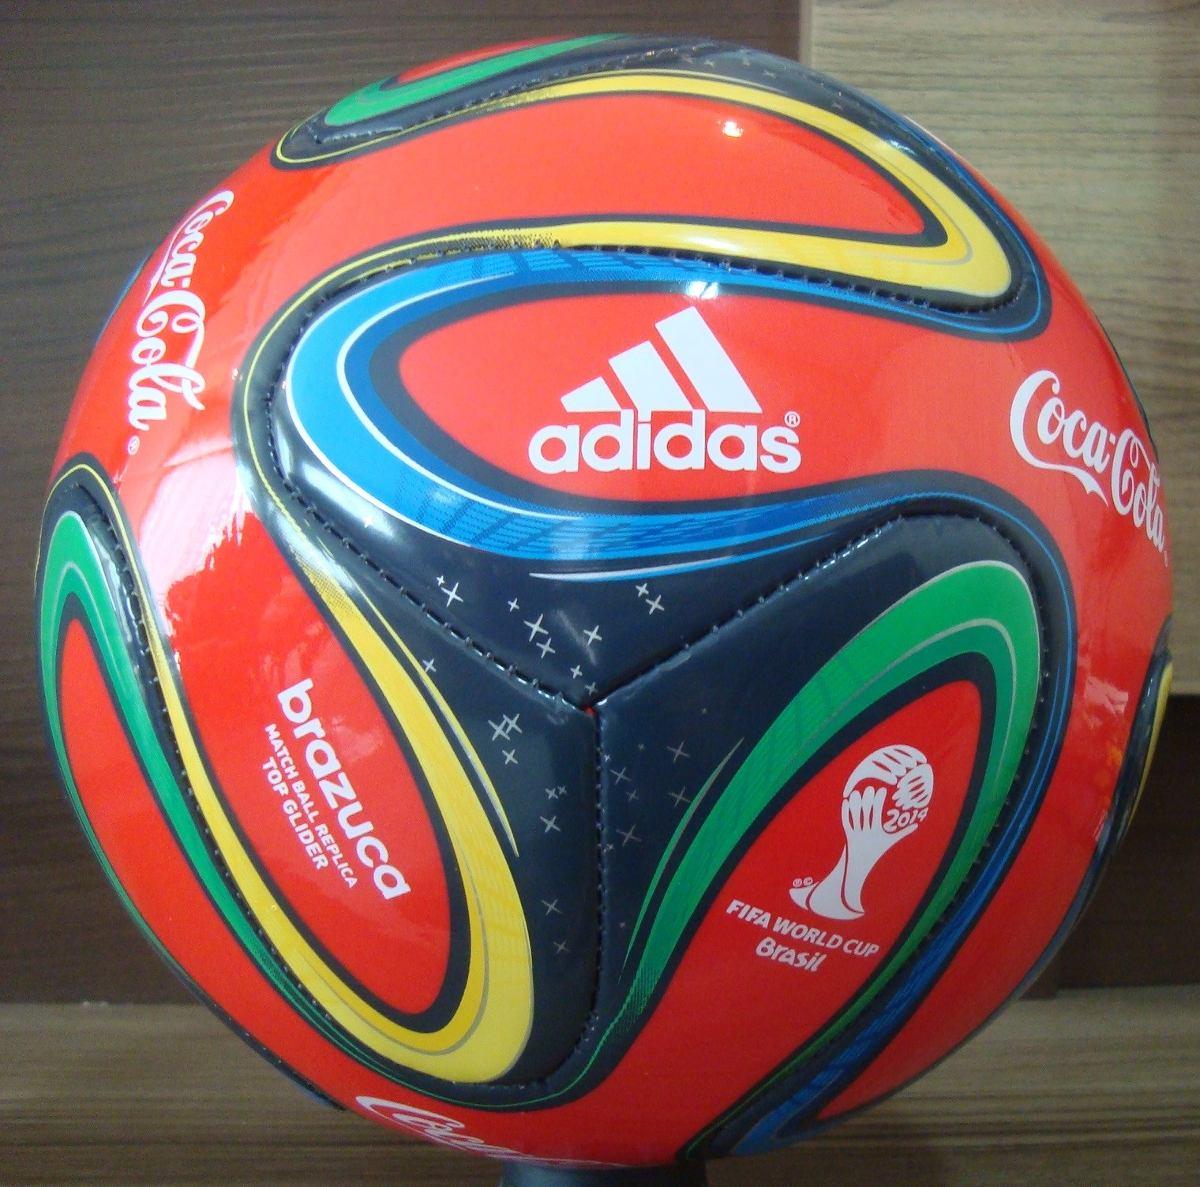 Jual Veja Fotos Da Brazuca Bola Da Copa Do Mundo De 2014 Bola Futsal ... 35bbd5fa0f3b3